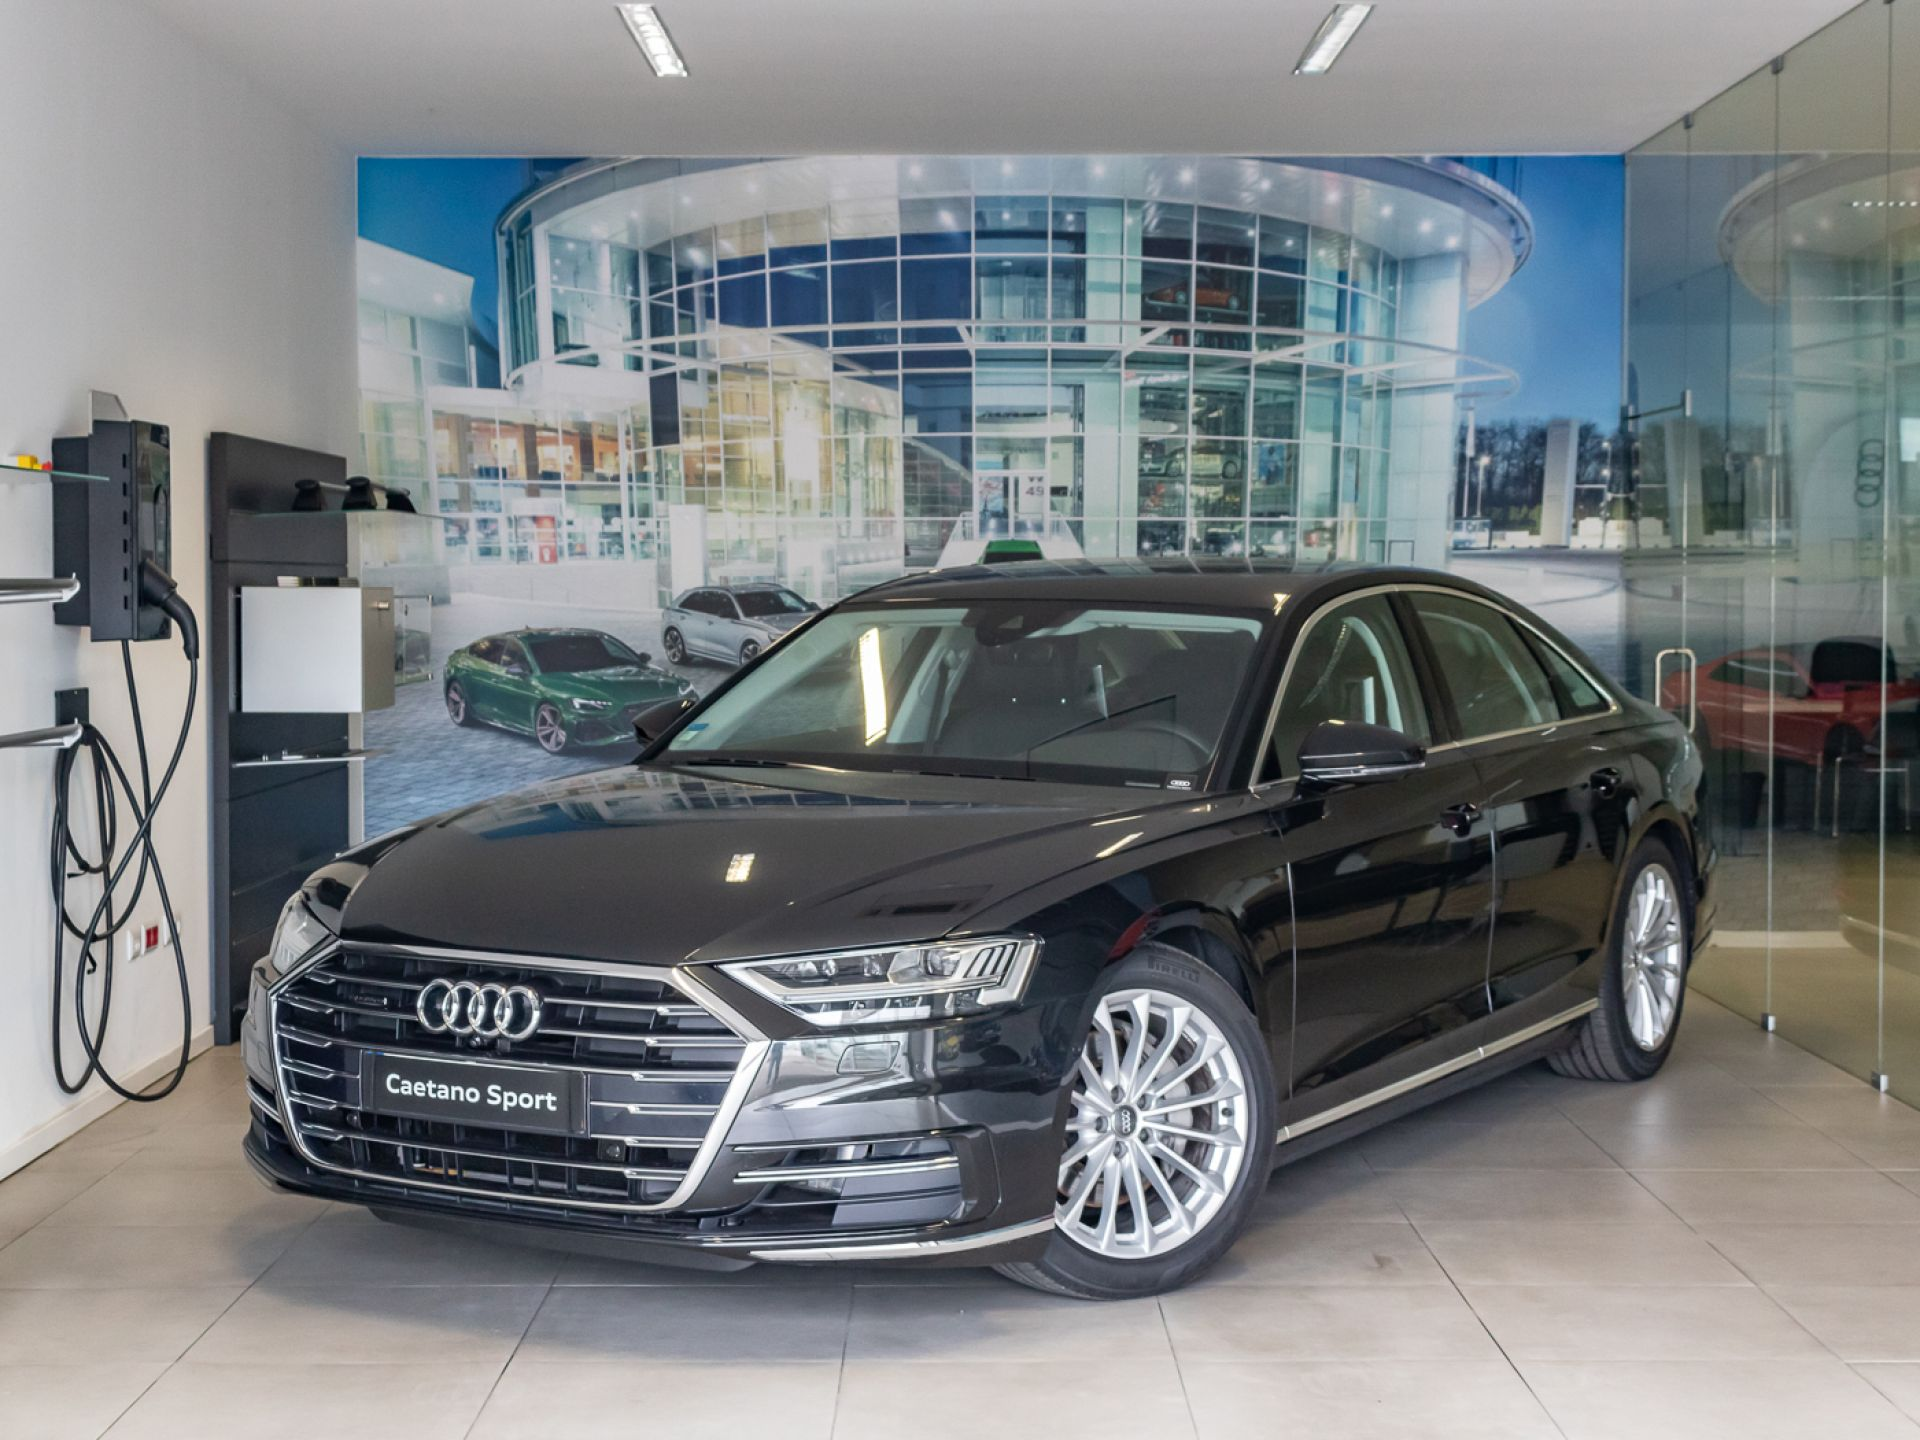 Audi A8 3.0 50 TDI MHEquattro tiptronic segunda mão Lisboa